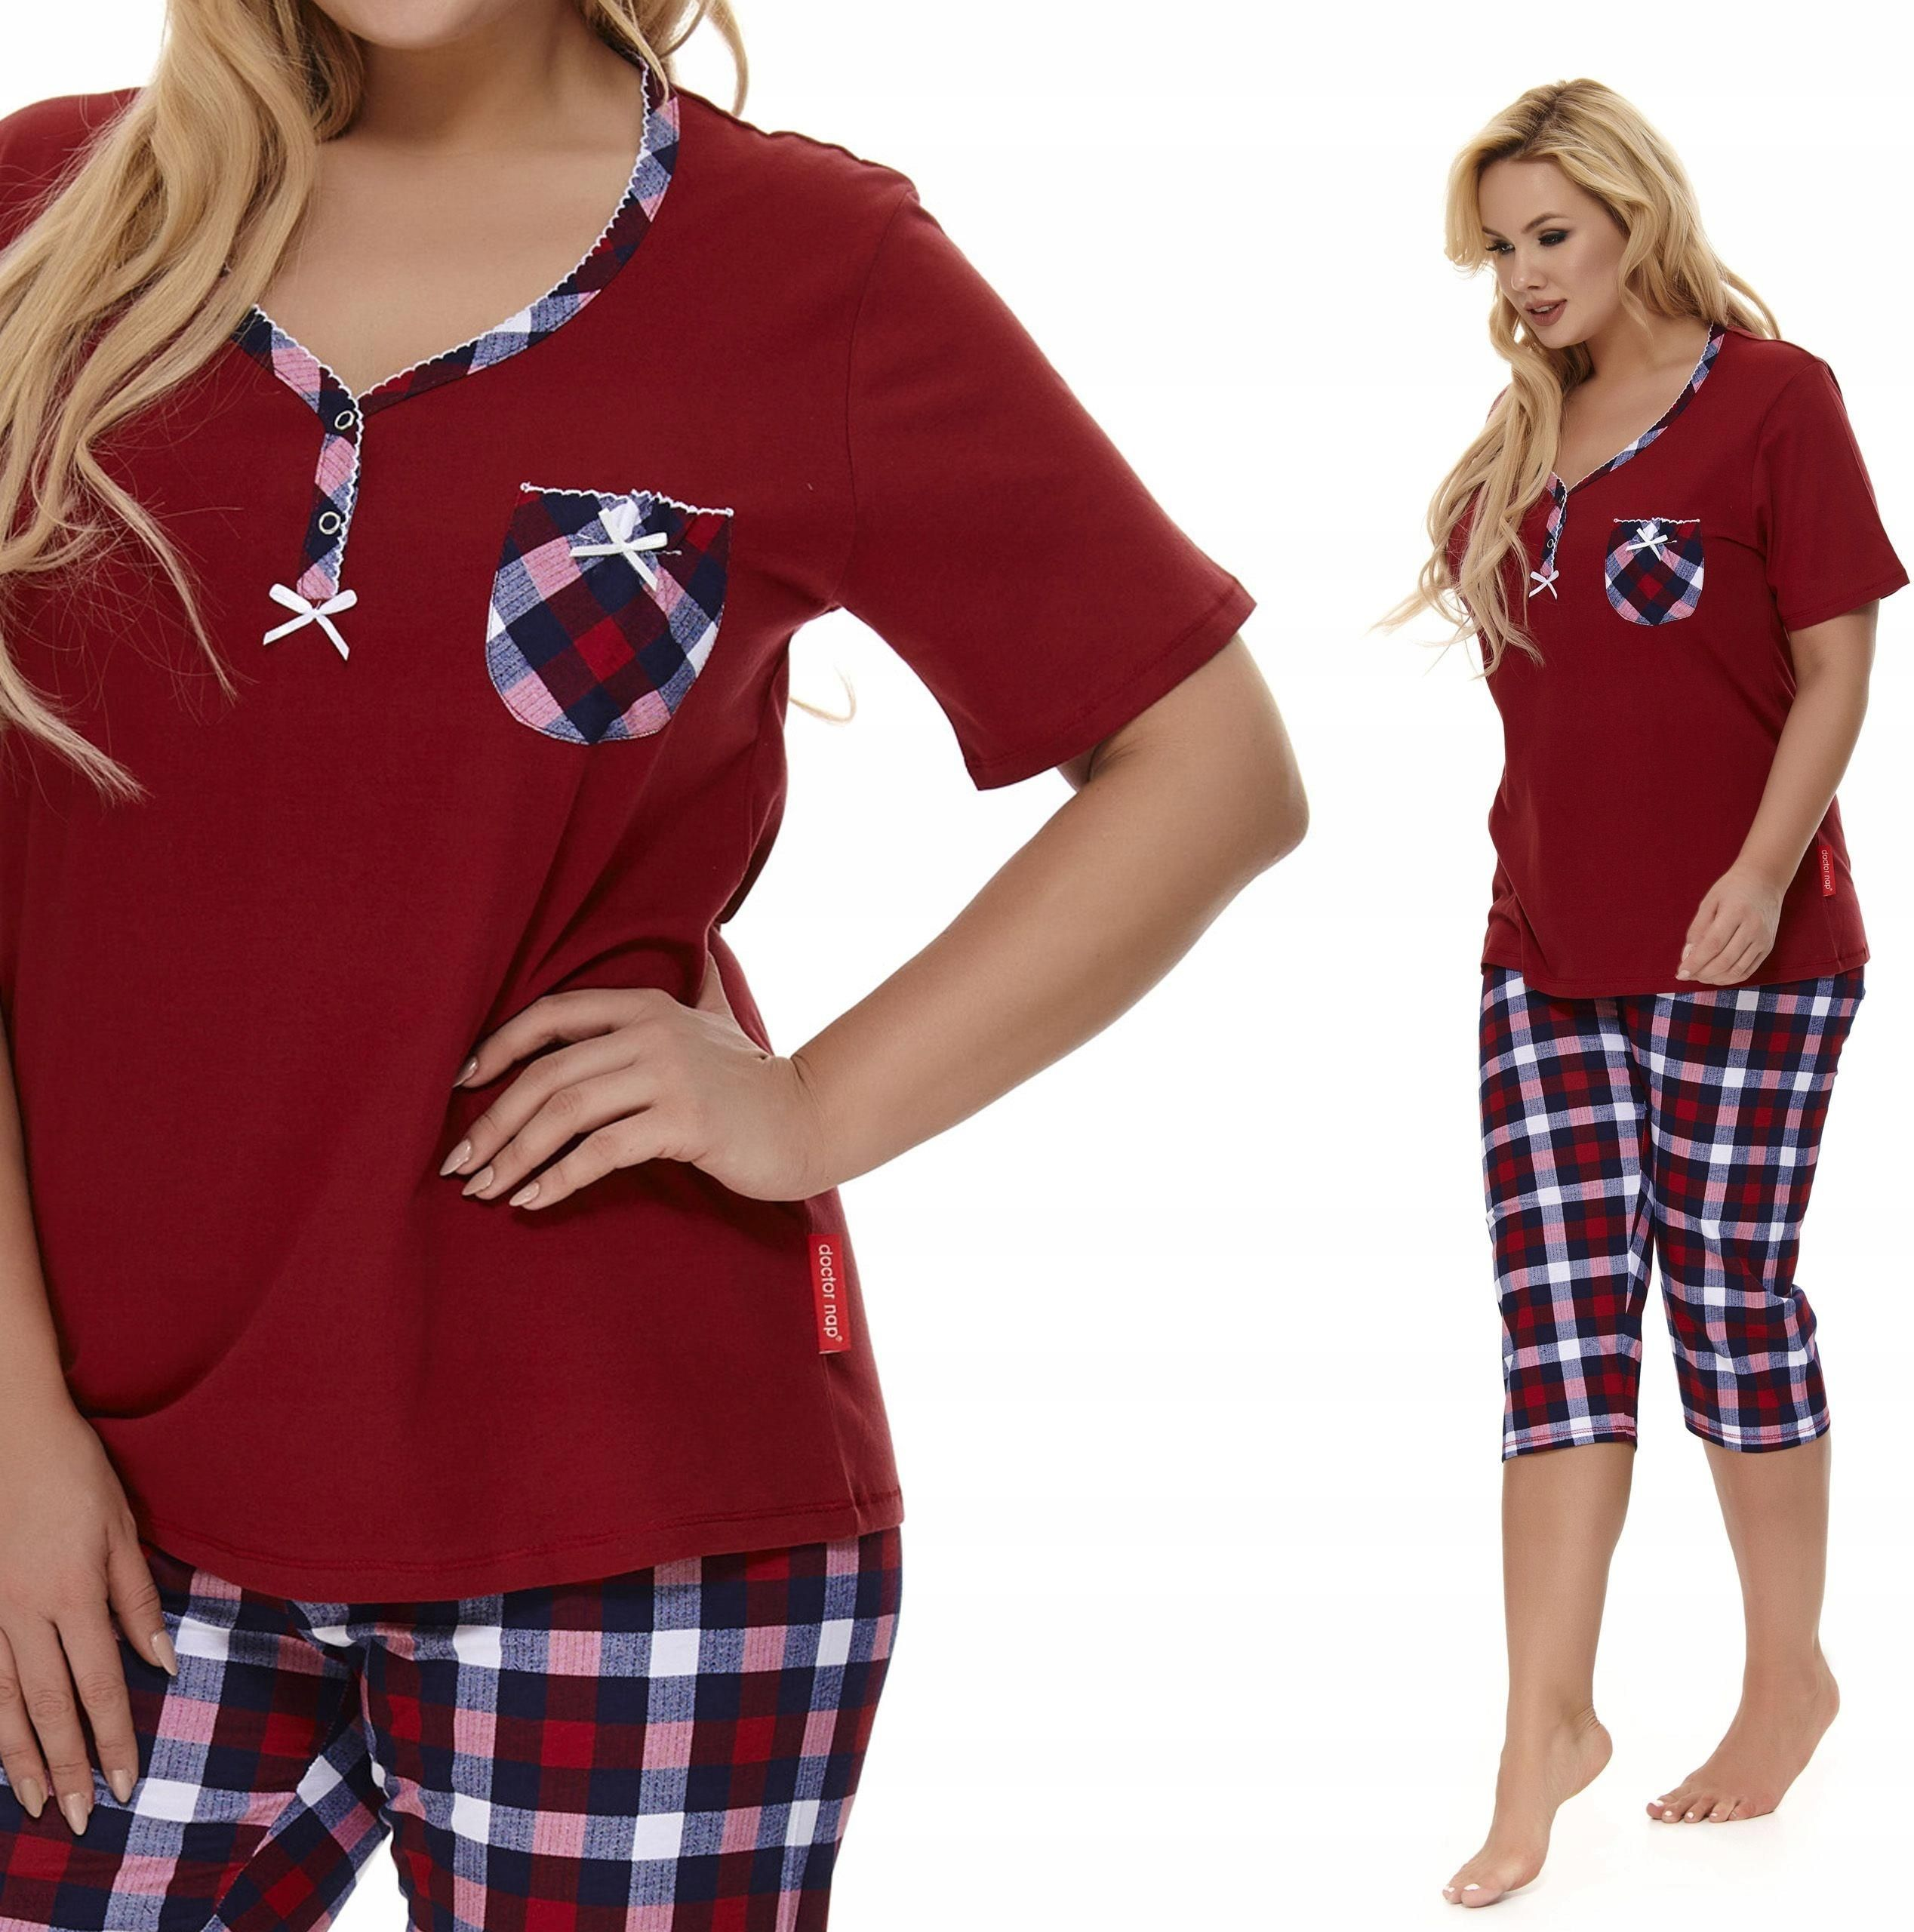 ca11cd18aced0b Pb 9647 Doctor Nap piżama damska elegancka bawełna - Ceny i opinie ...